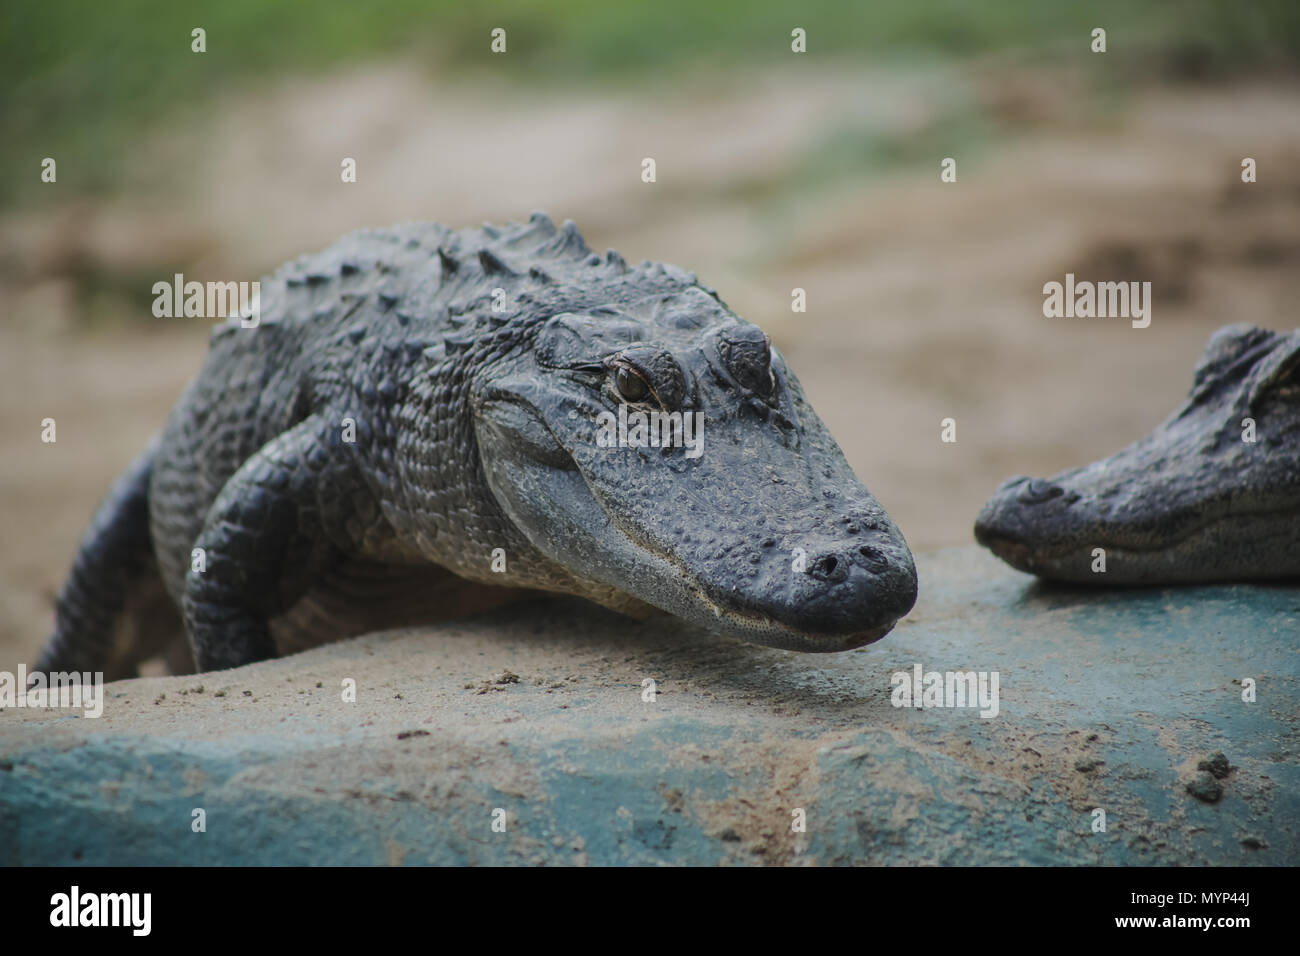 Alligator - Stock Image